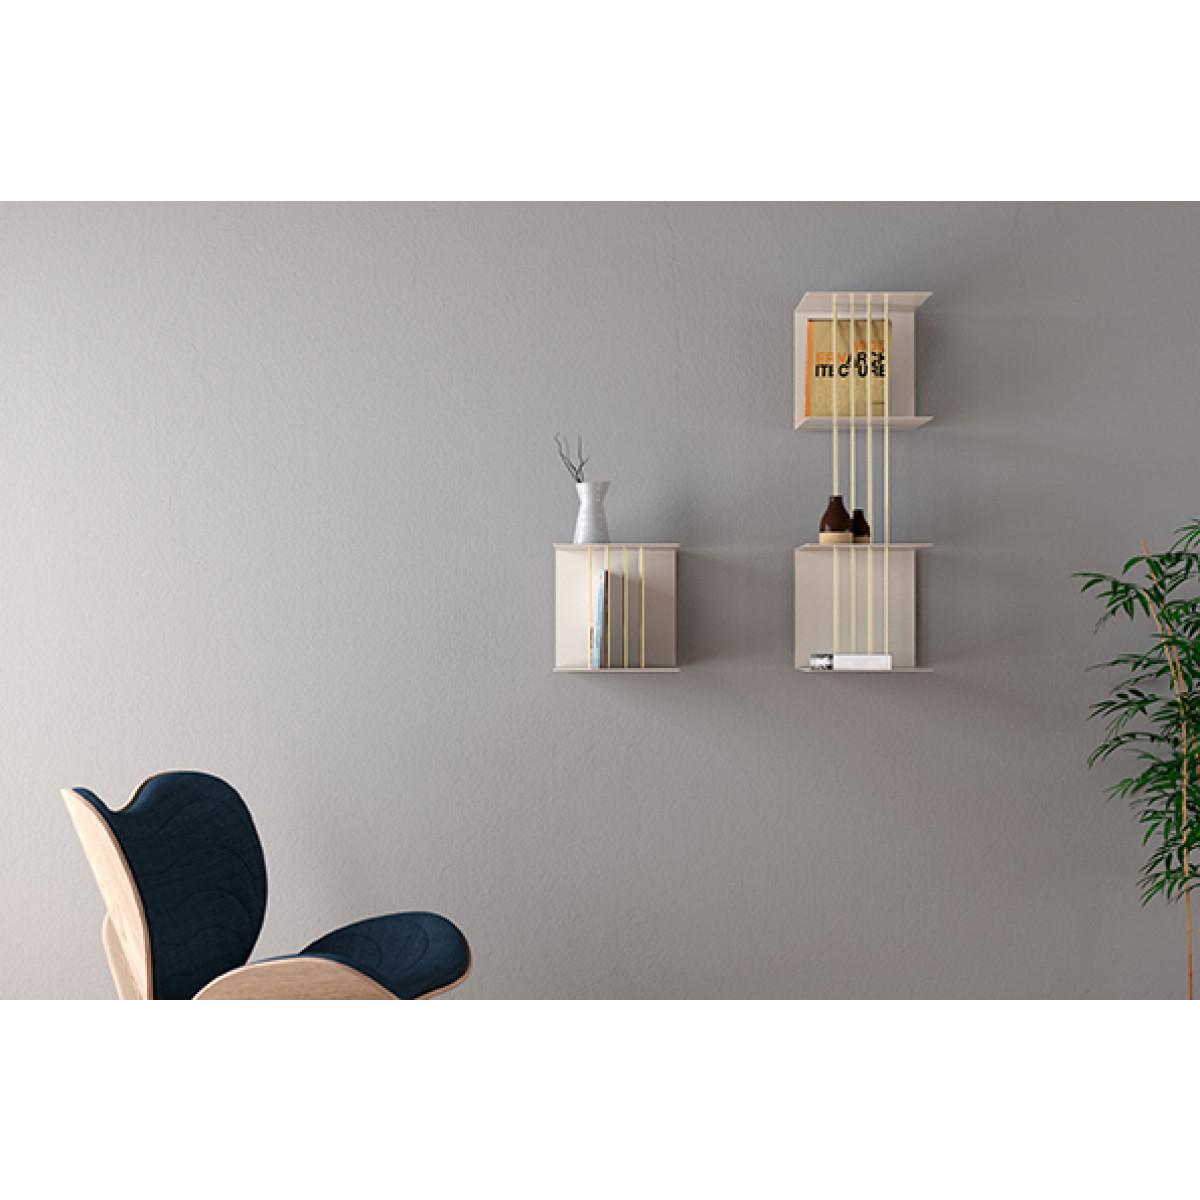 Extra Space Rods / Shelf Divider for Teaser Shelf | Brass